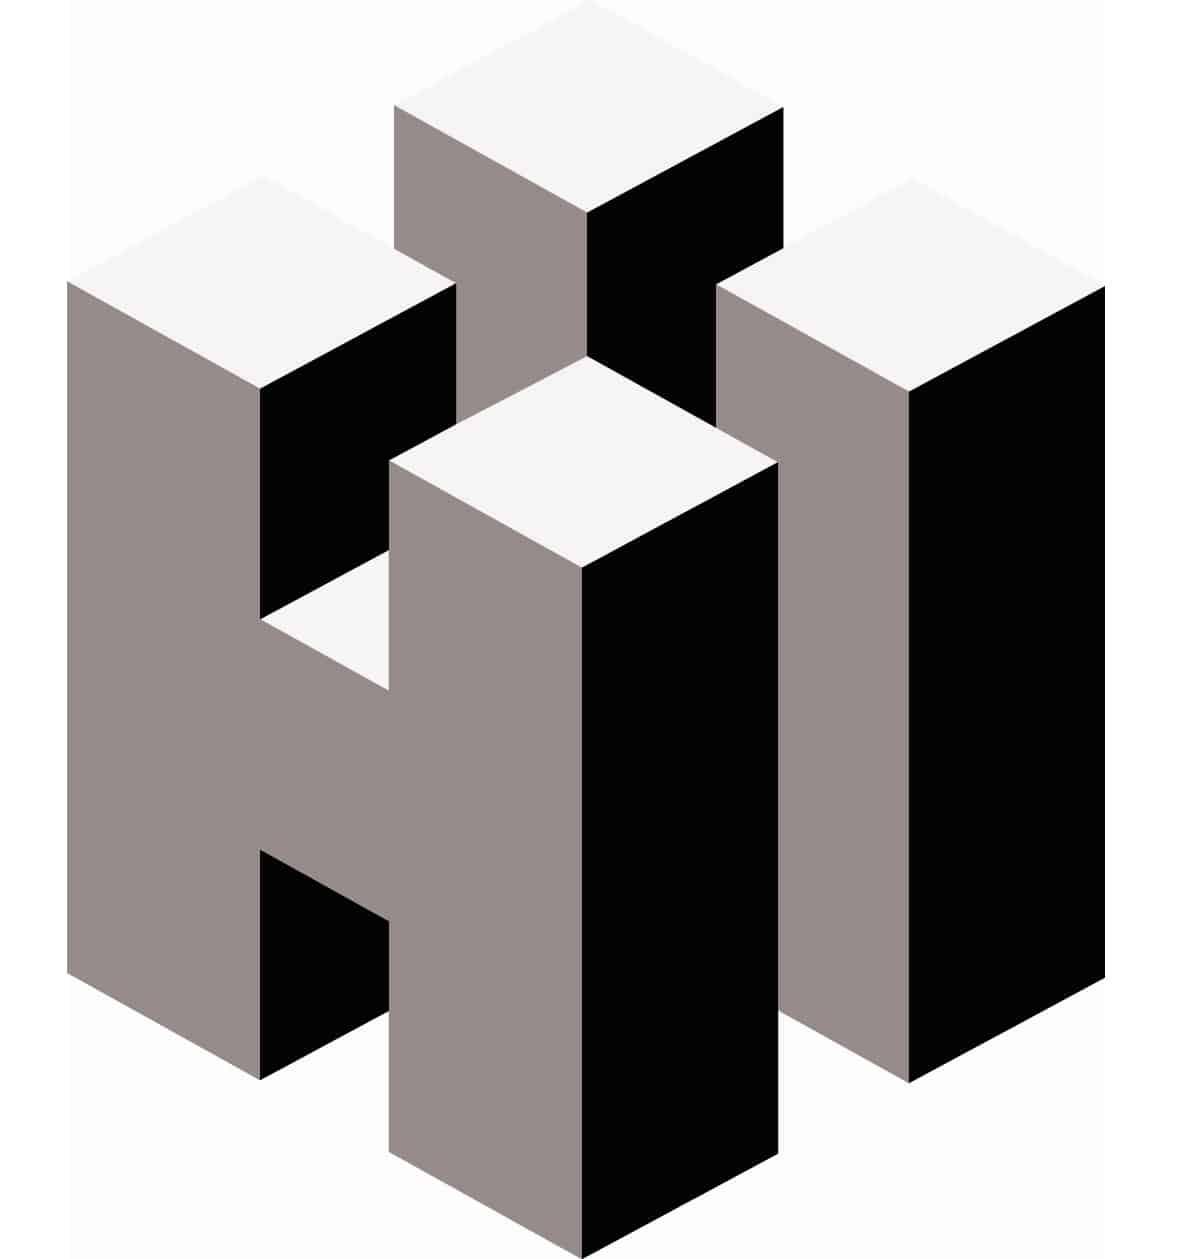 HIIG (large) New Image